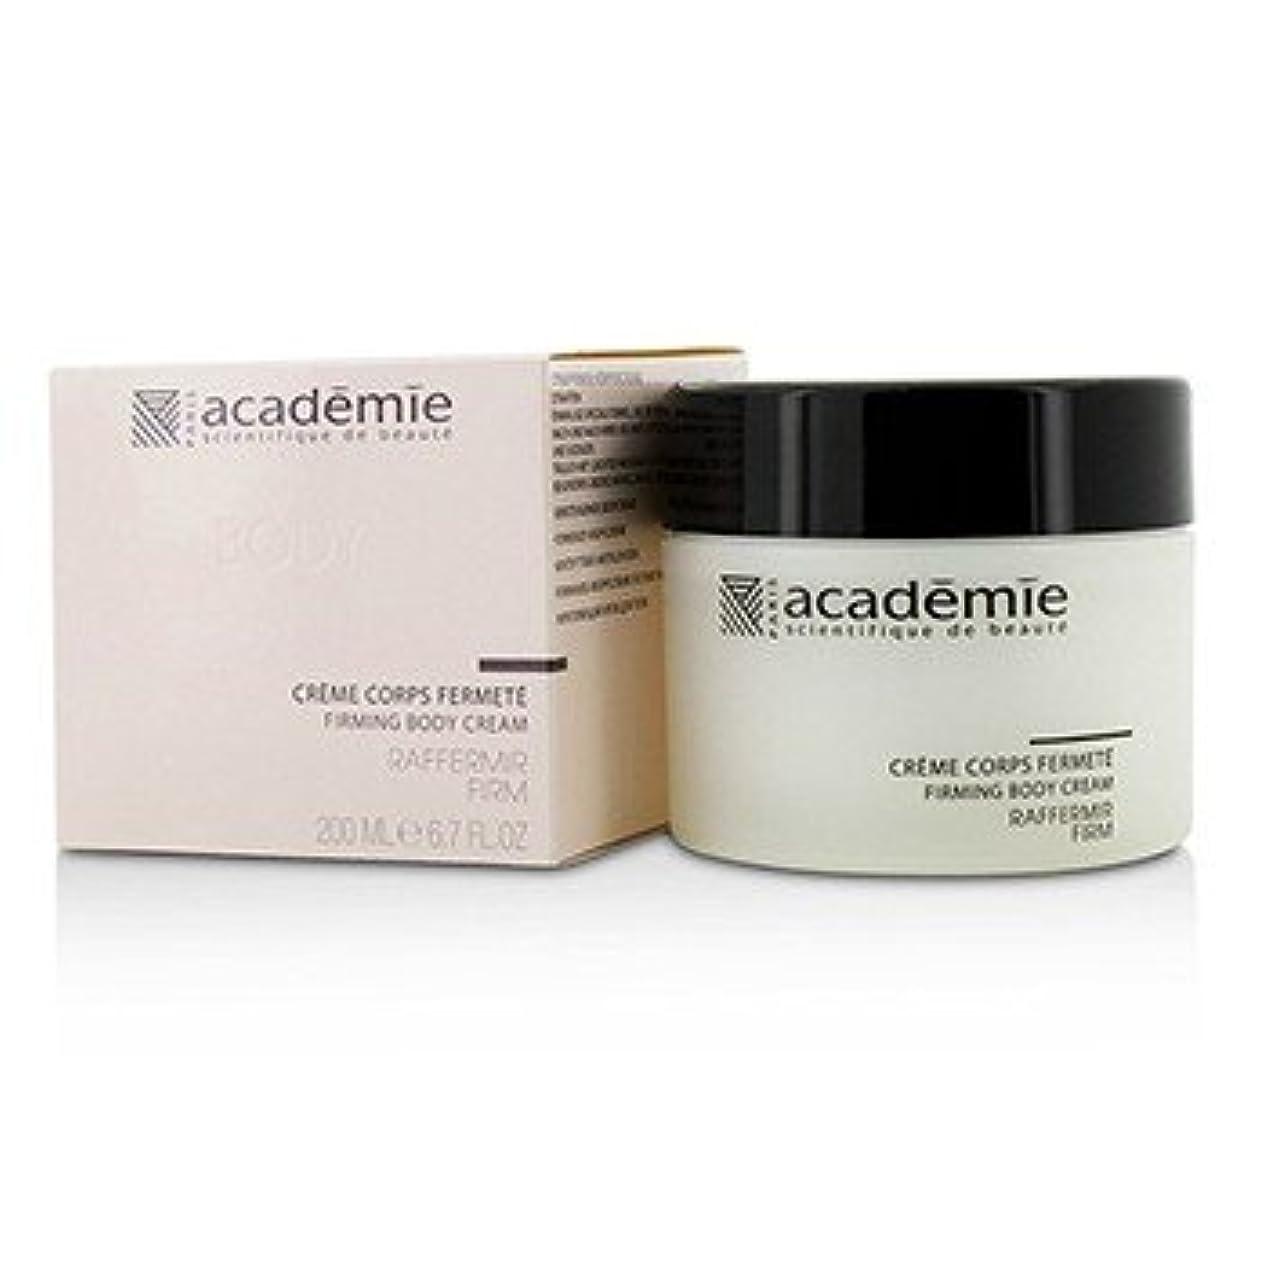 [Academie] Firming Body Cream 200ml/6.7oz